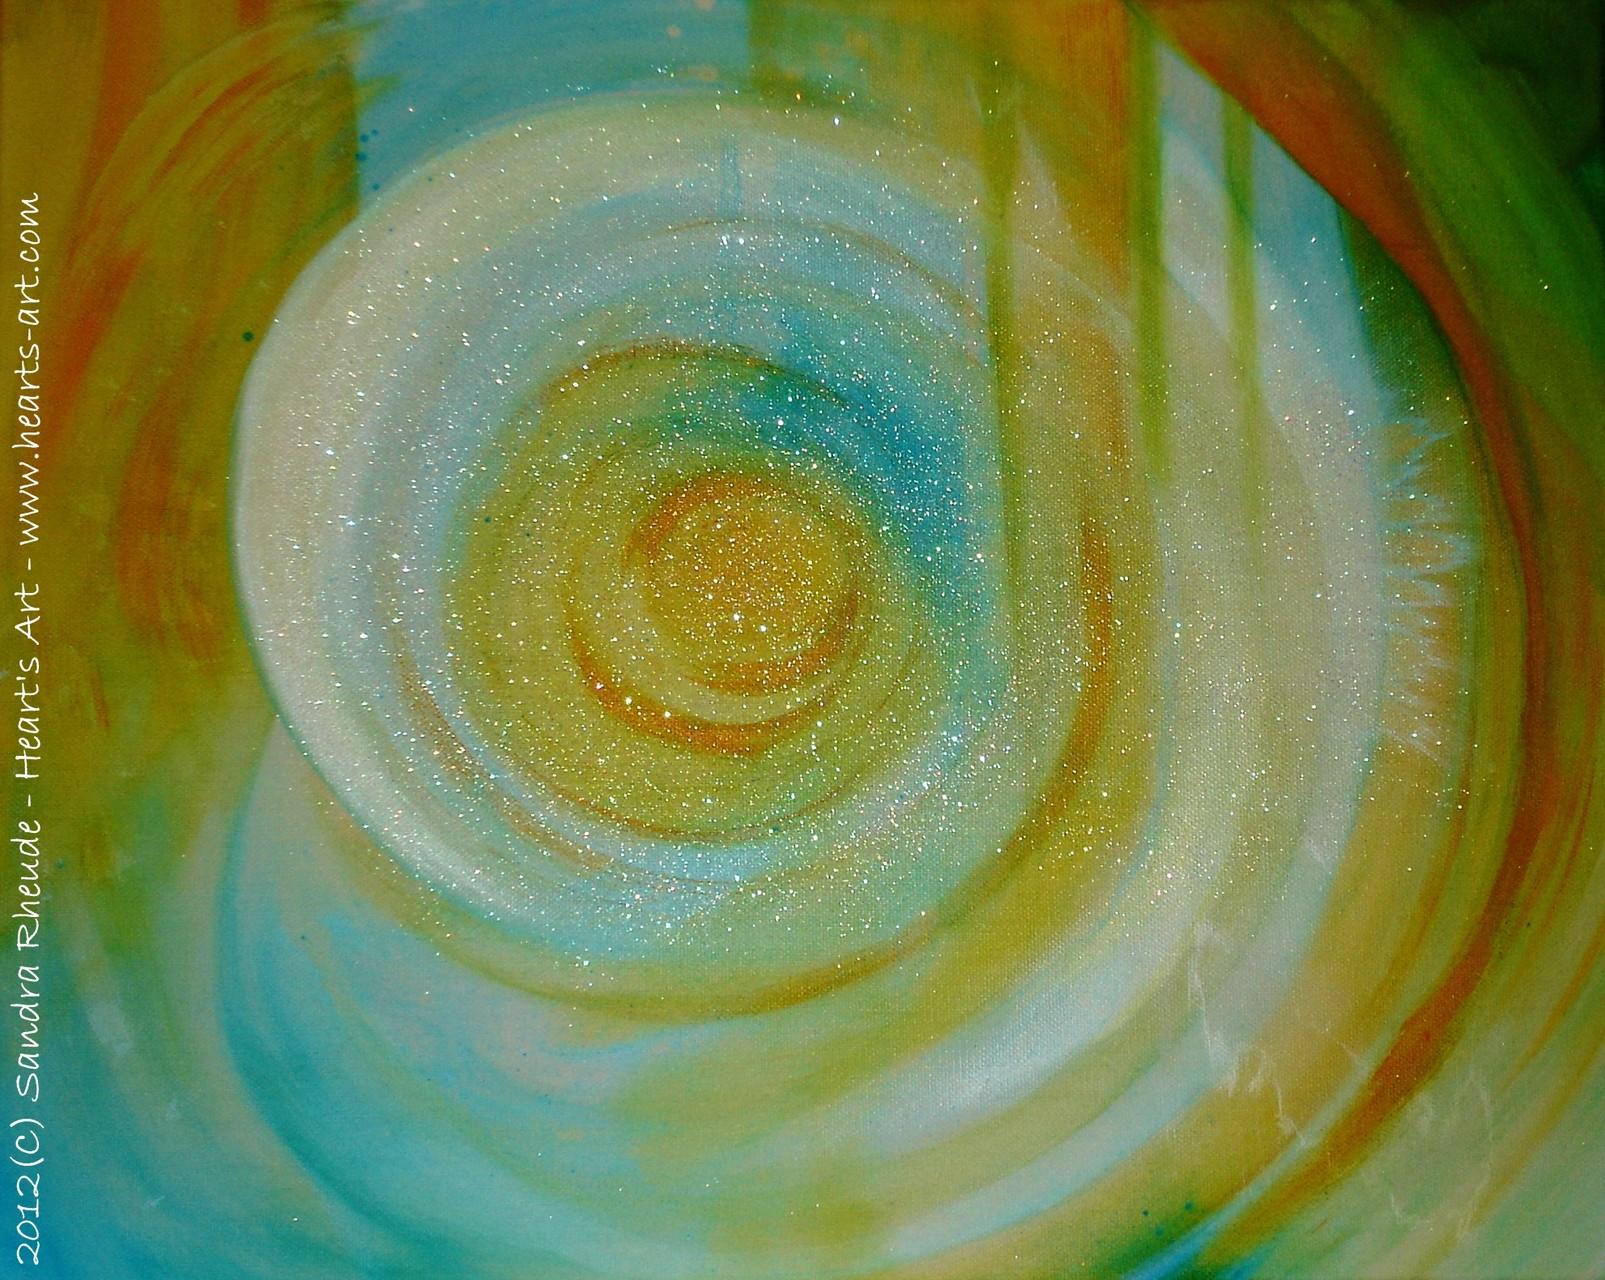 'Atlantis' - 2012/79 - Acryl auf Leinwand - 50 x 40 cm - € 170